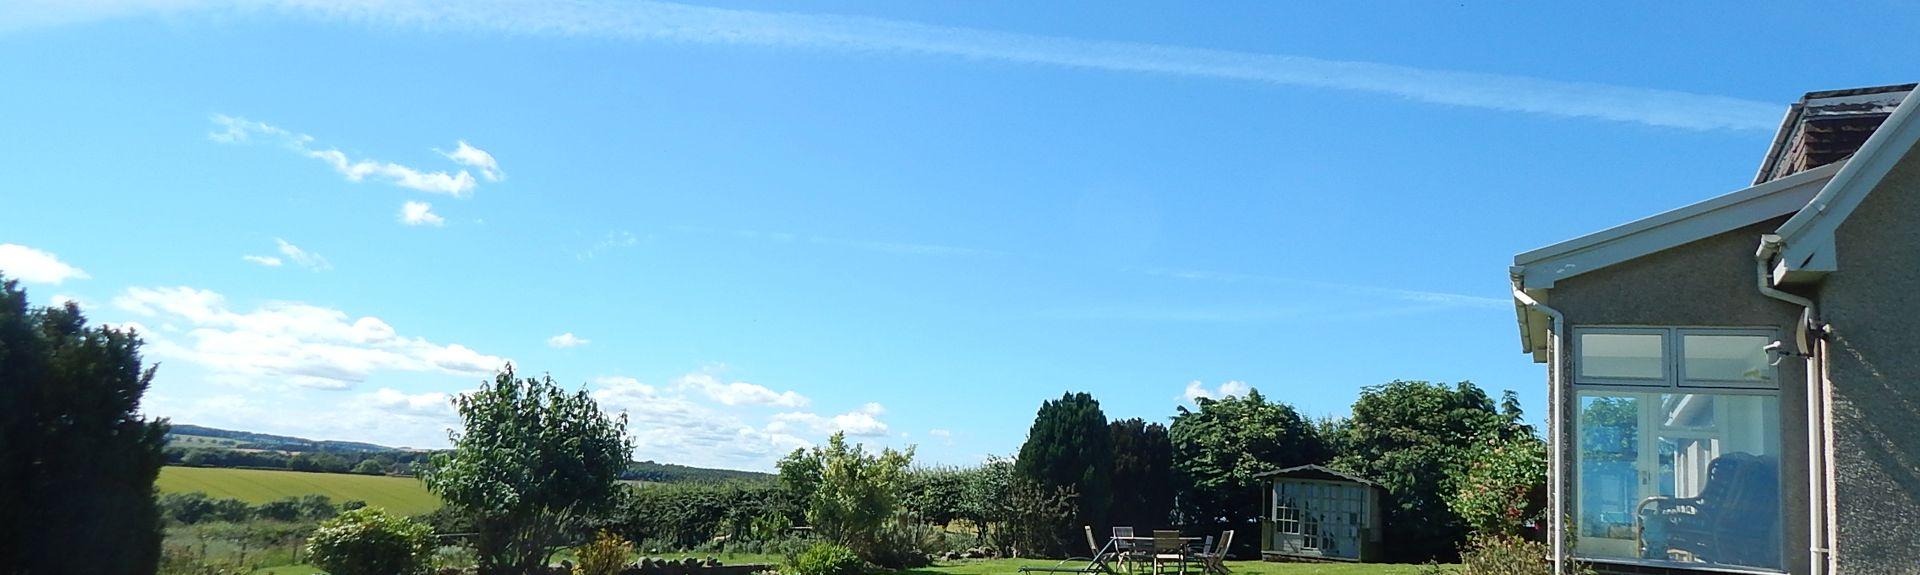 Chain Bridge Honey Farm, Berwick-upon-Tweed, England, UK